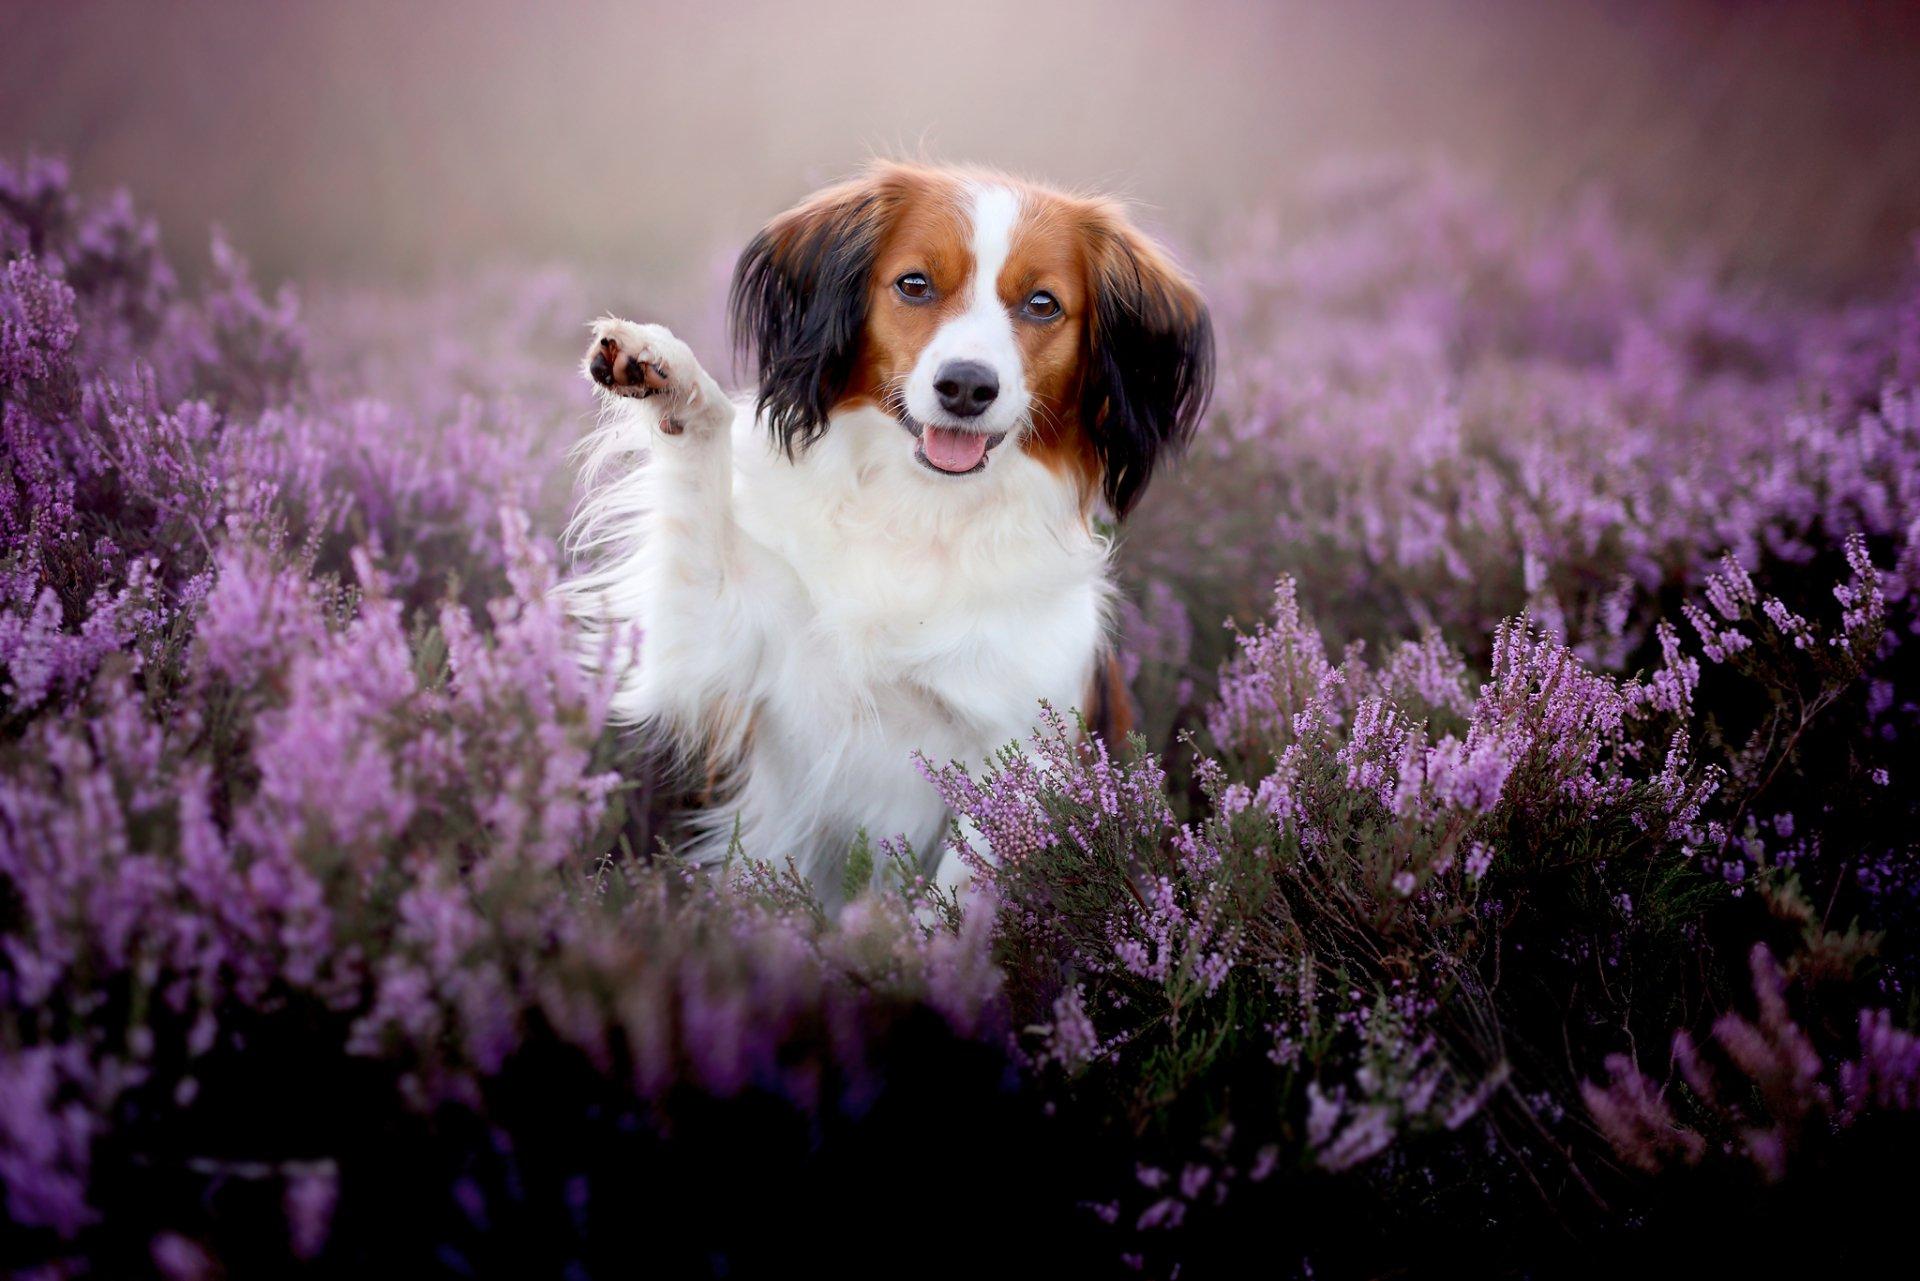 Dog Hd Wallpaper Background Image 2048x1366 Id